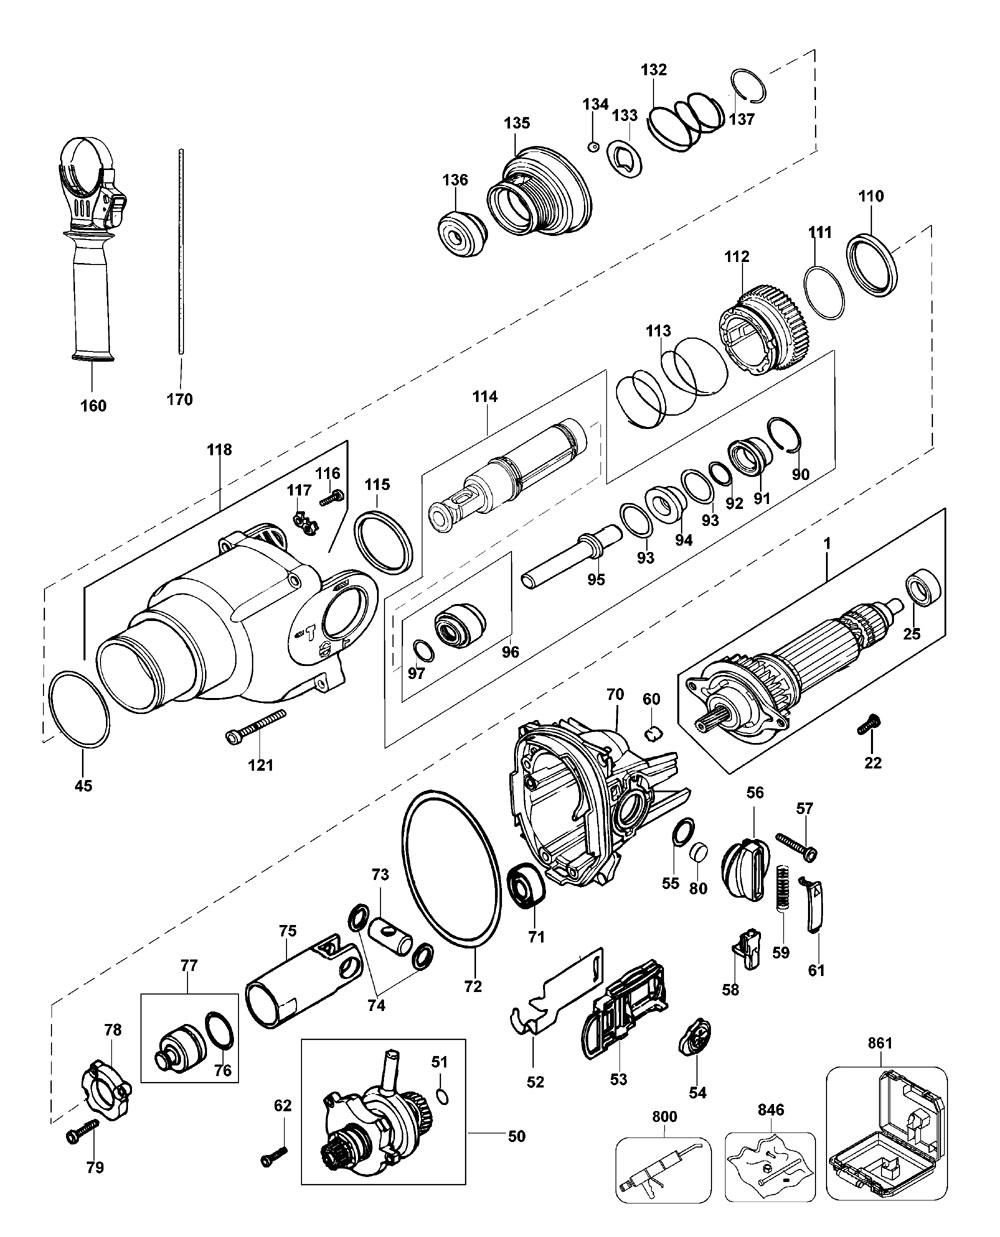 D25103K-Dewalt-T1-PB-1Break Down